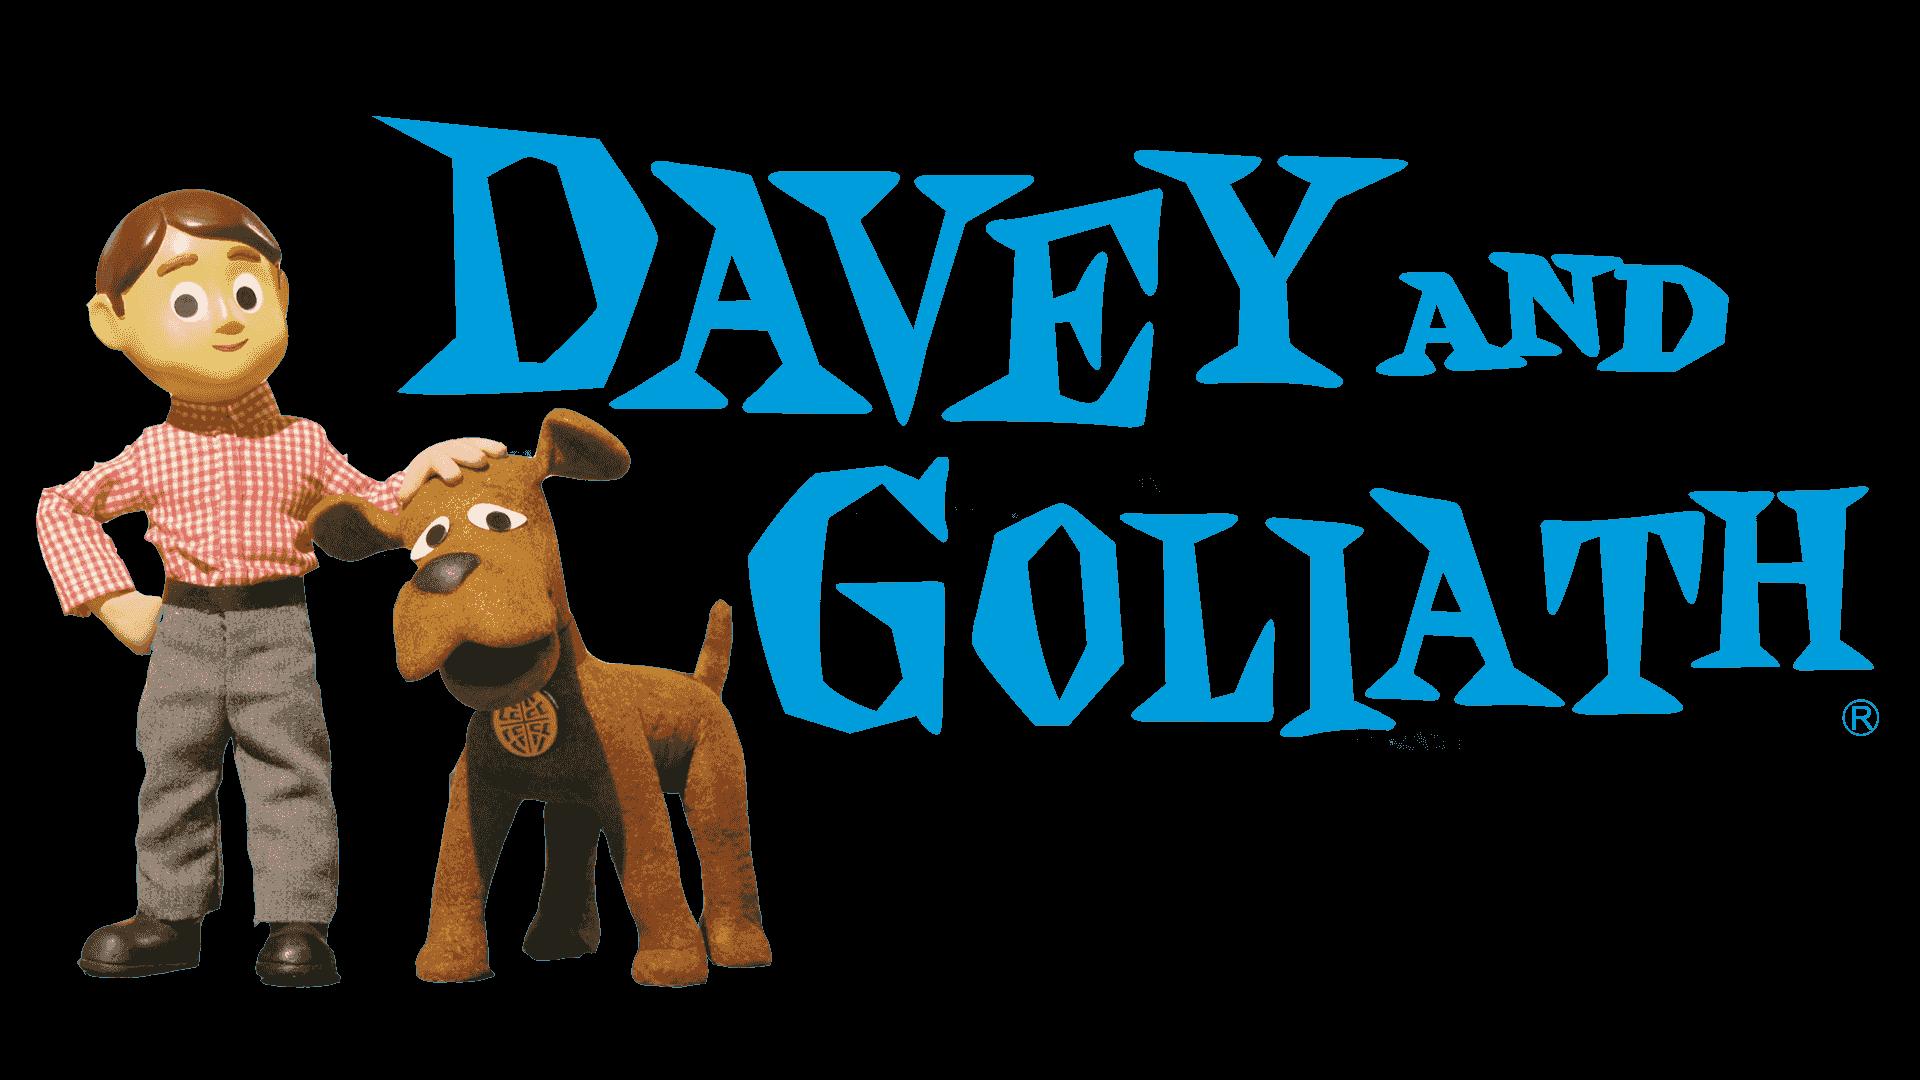 Davey goliath logo